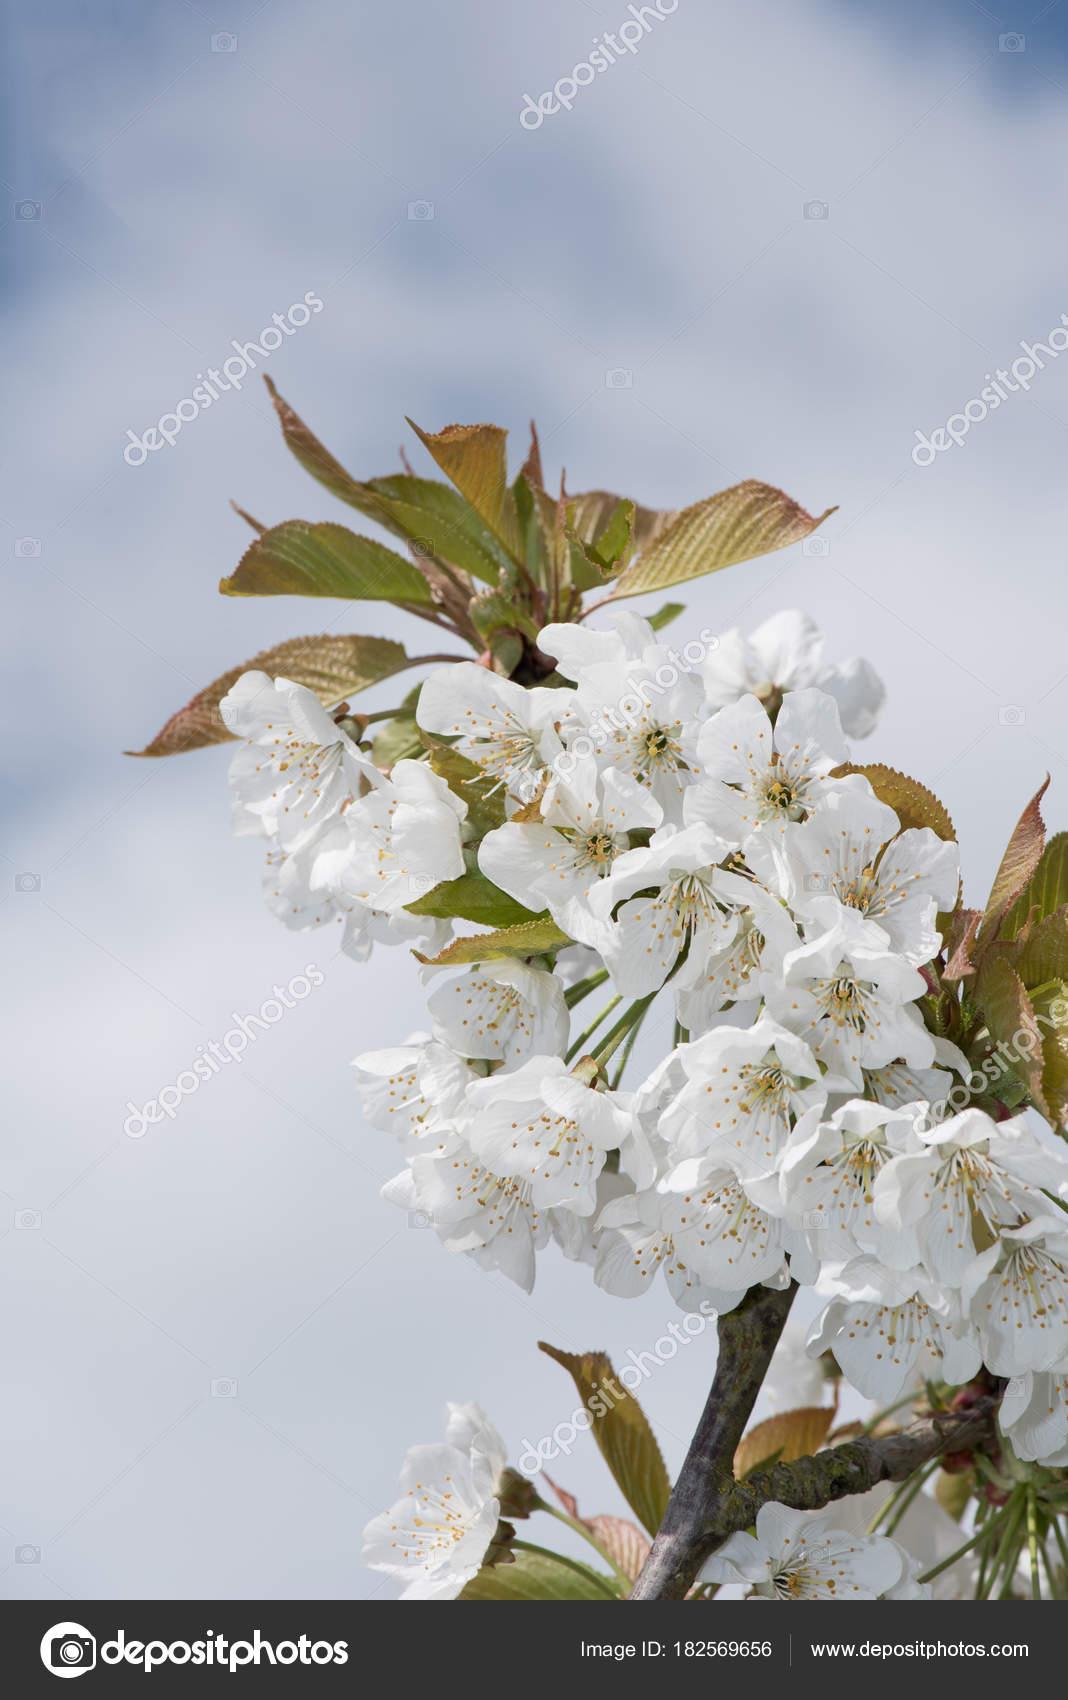 Branch white flowers cherry blossom tree blue cloudy sky background branch of white flowers cherry blossom tree on blue cloudy sky background photo by njaj mightylinksfo